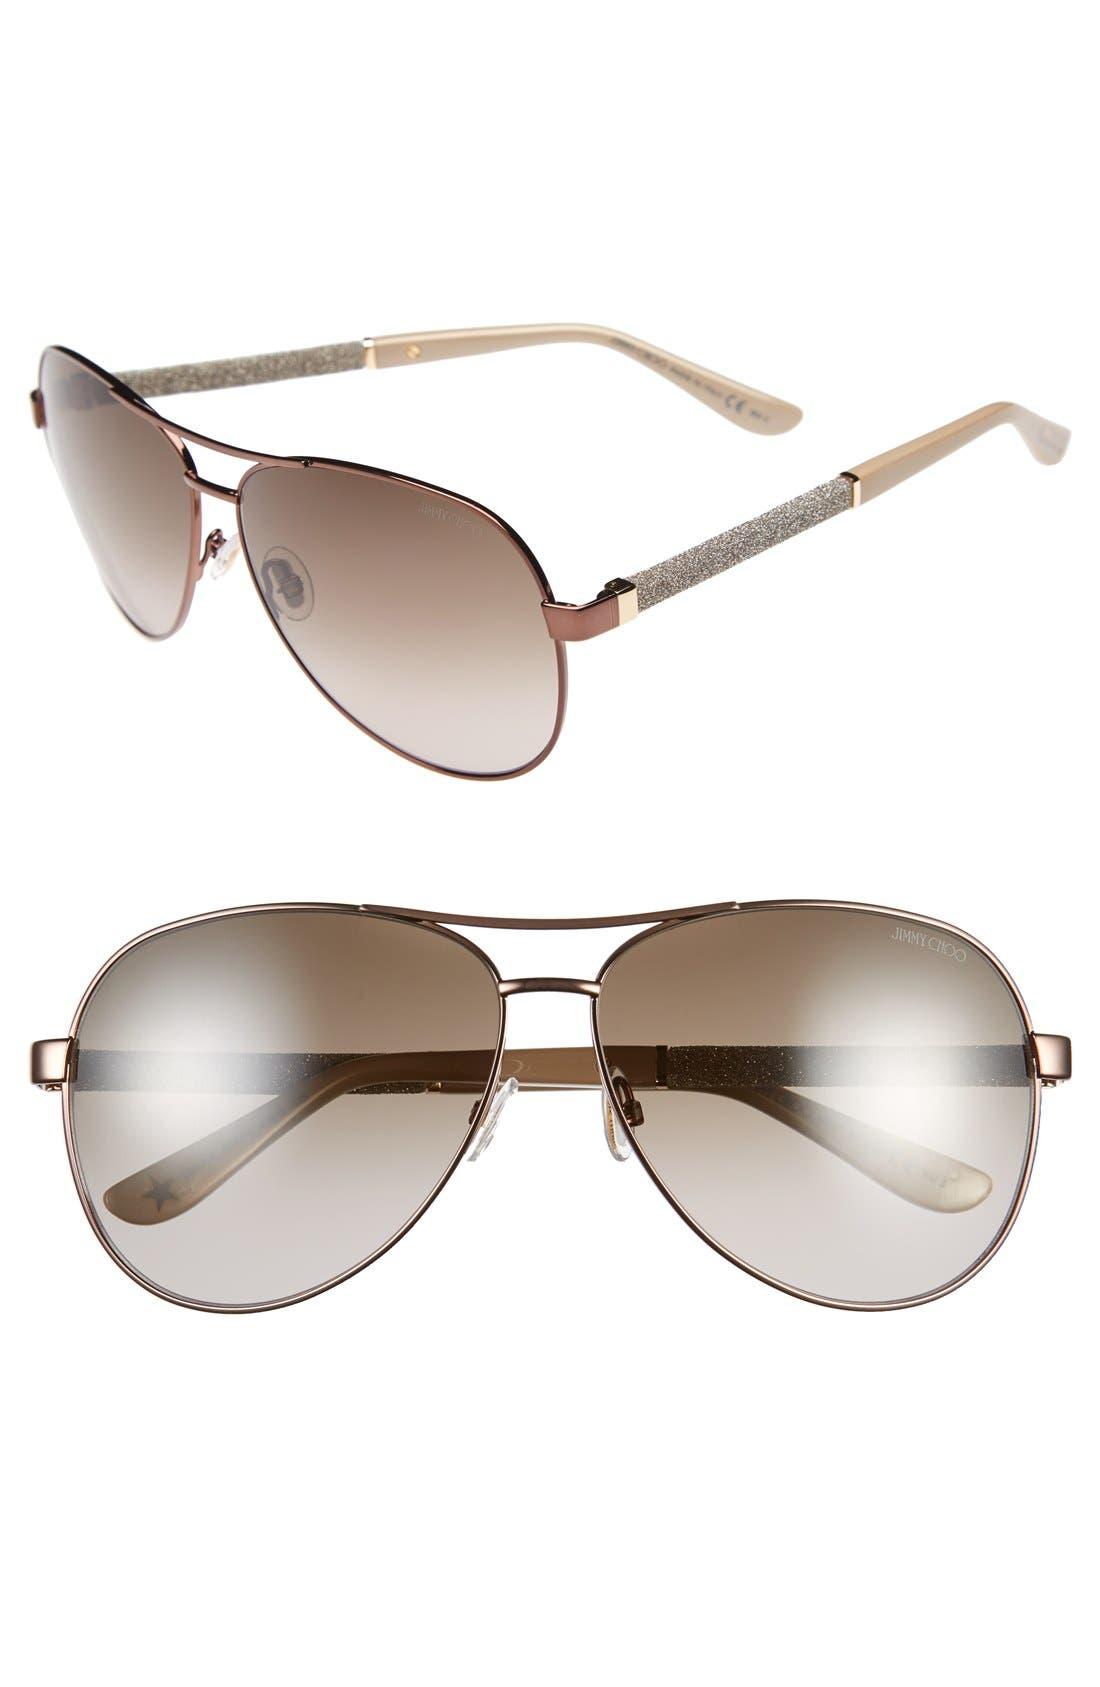 61mm Aviator Sunglasses,                         Main,                         color,